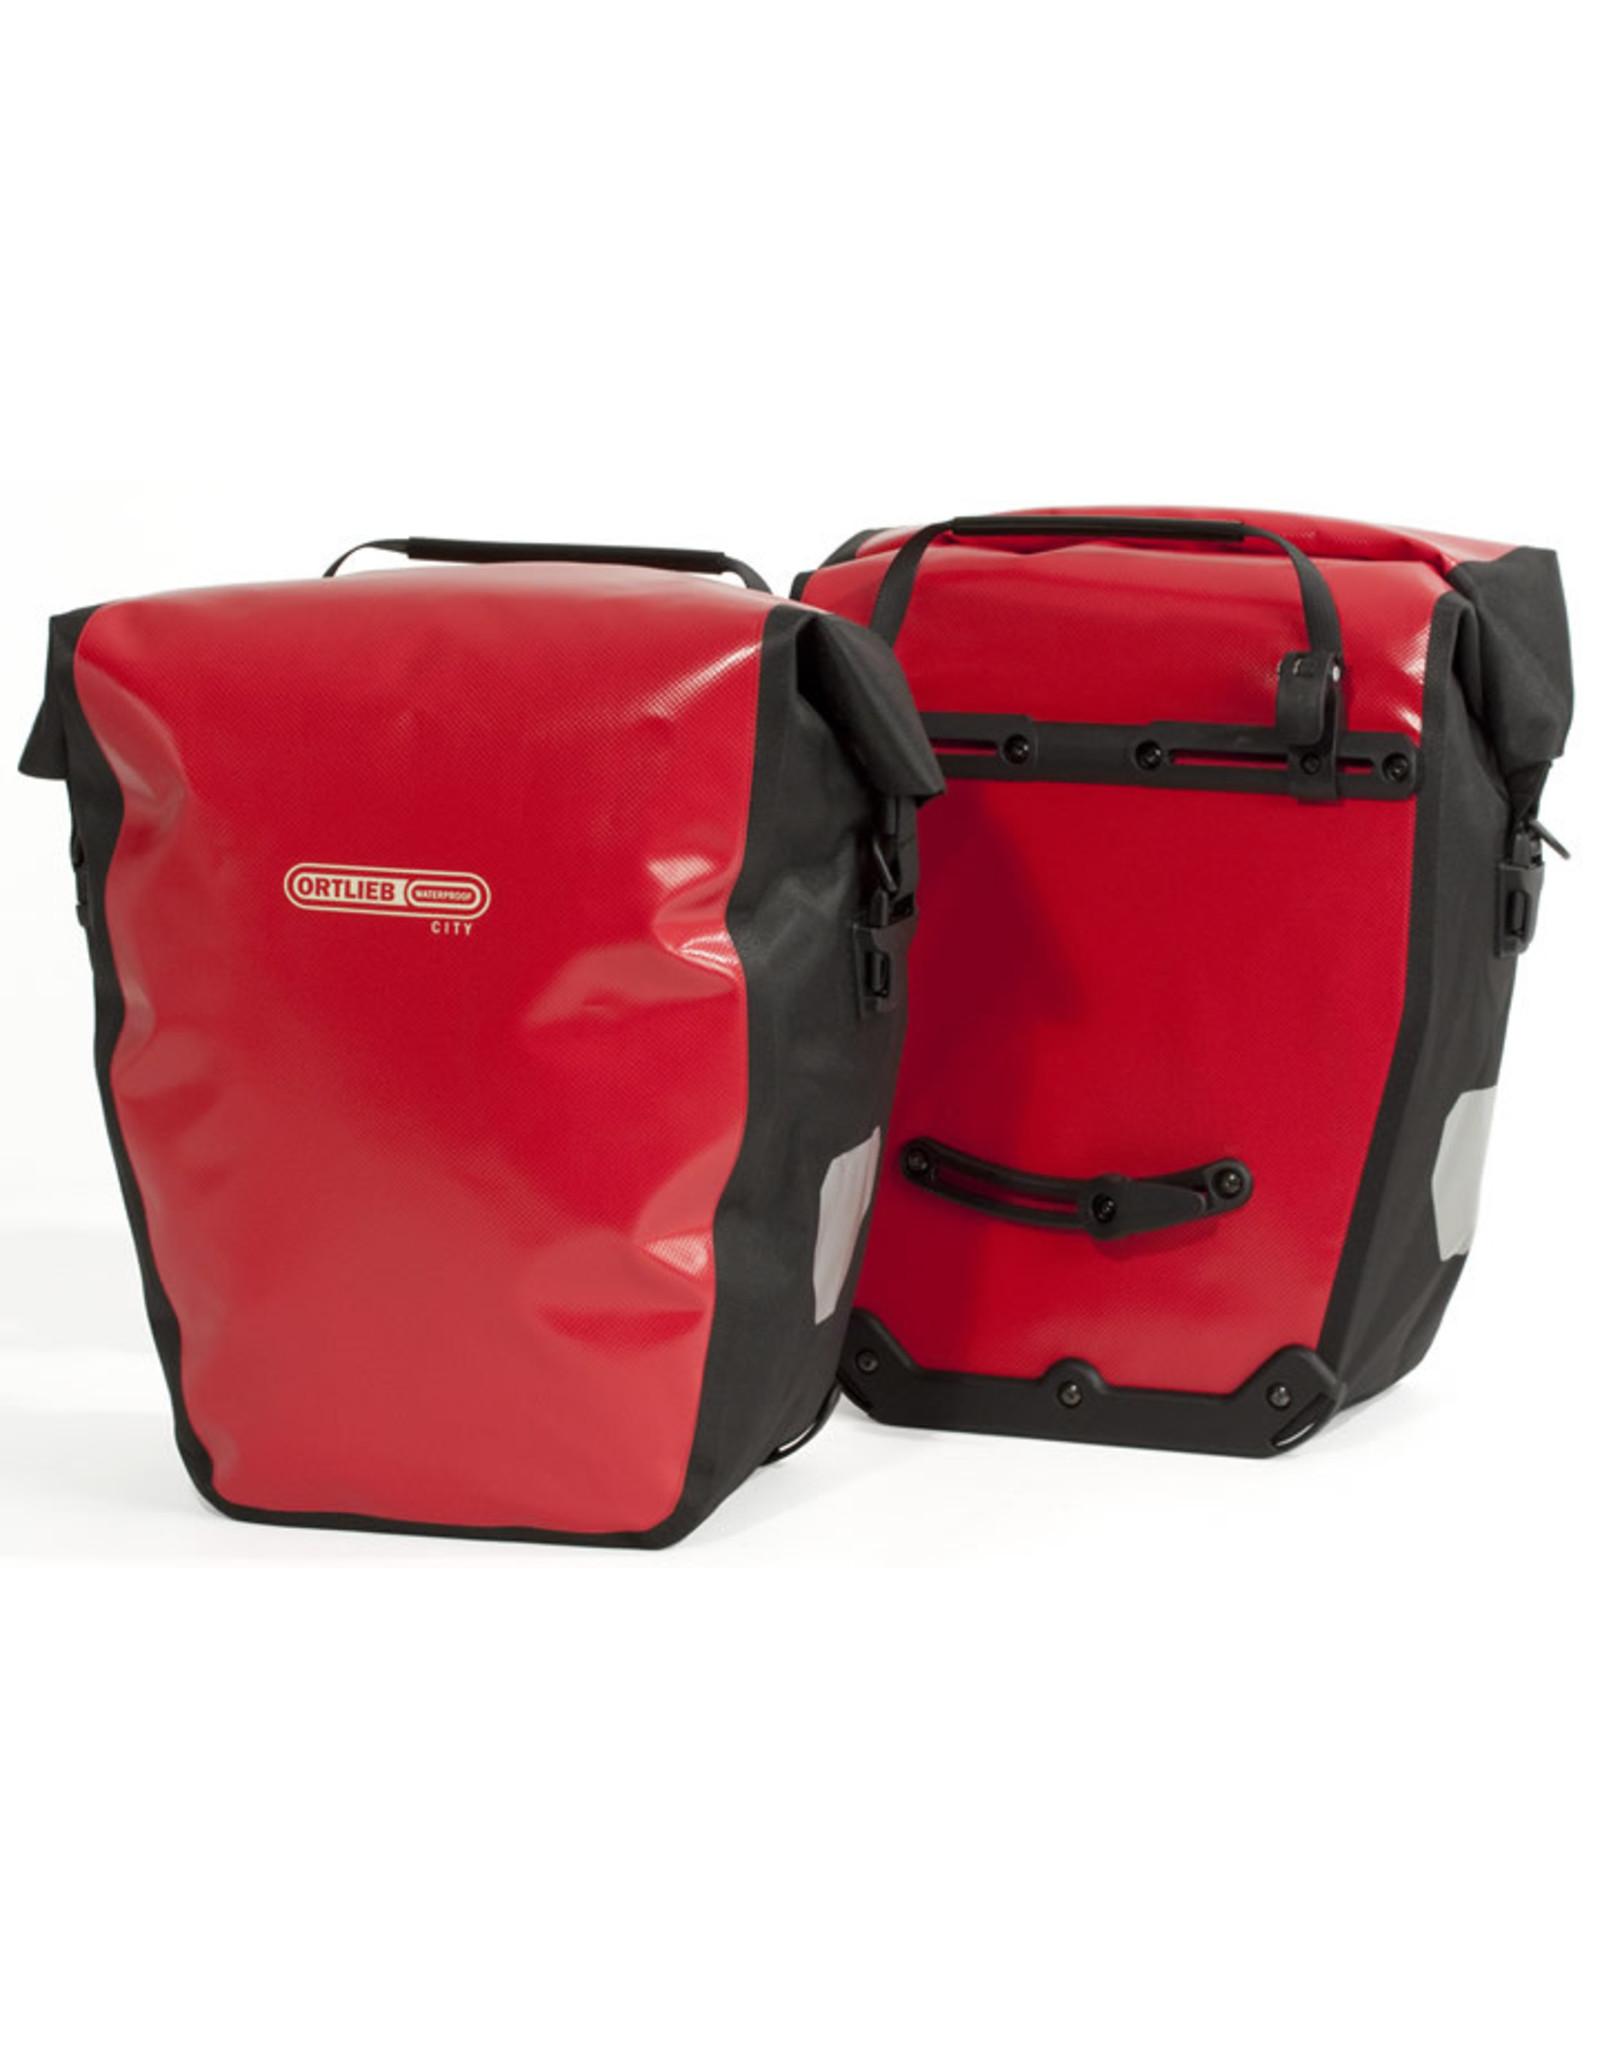 Ortlieb Ortlieb Back Roller City Rear Pannier: Pair Red/Black 40L